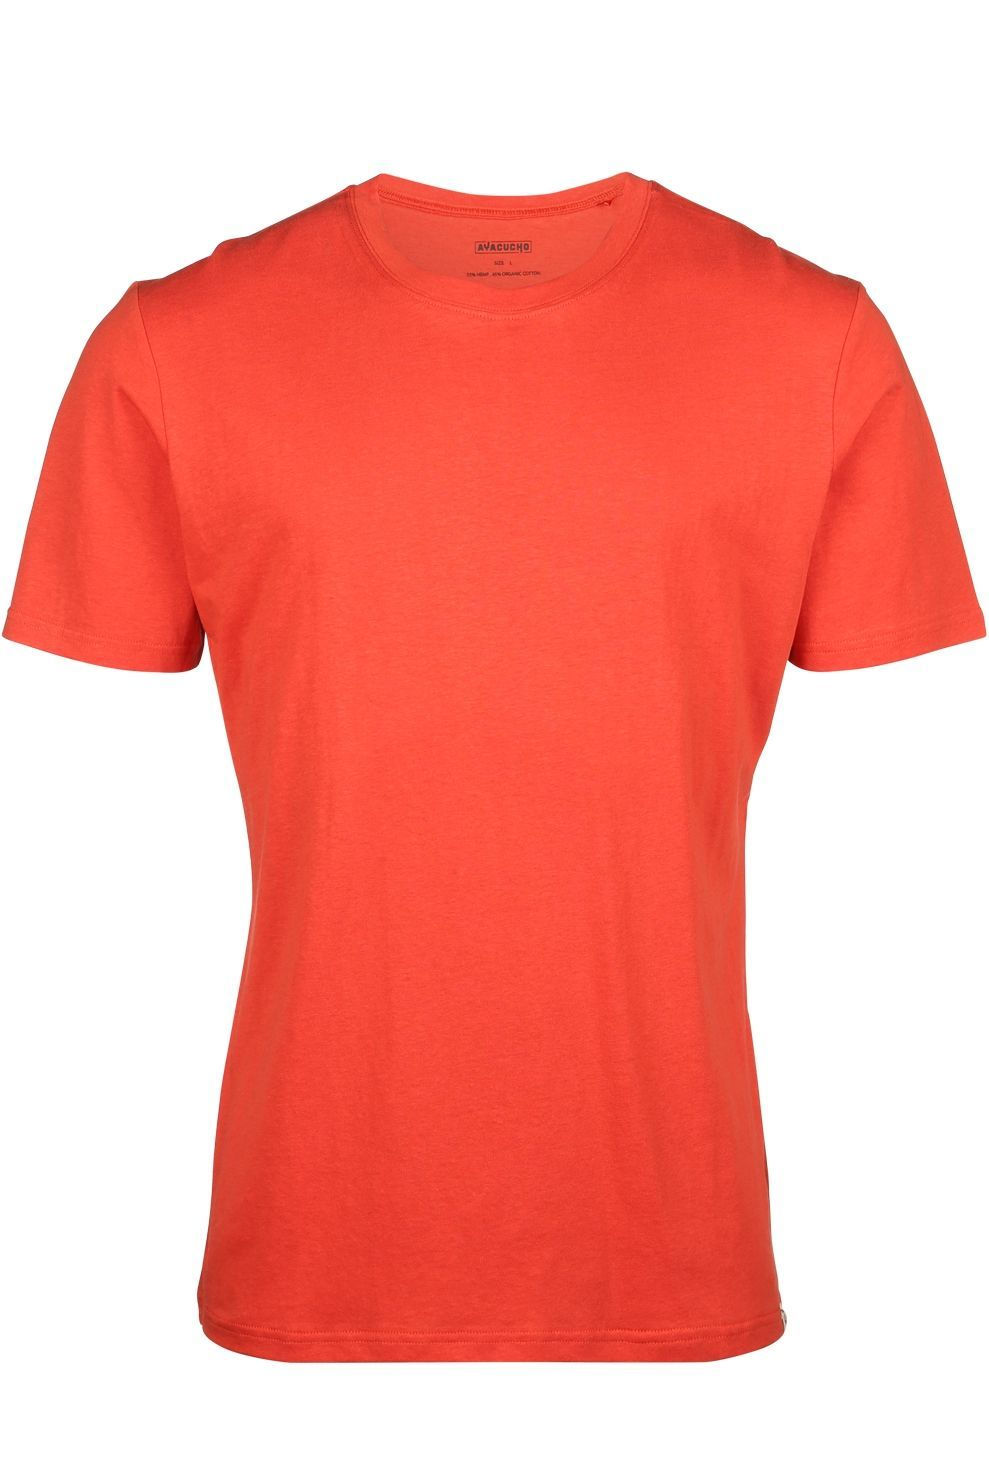 Ayacucho T-Shirt Goa M voor heren - Rood - Maten: S, M, L, XL, XXL